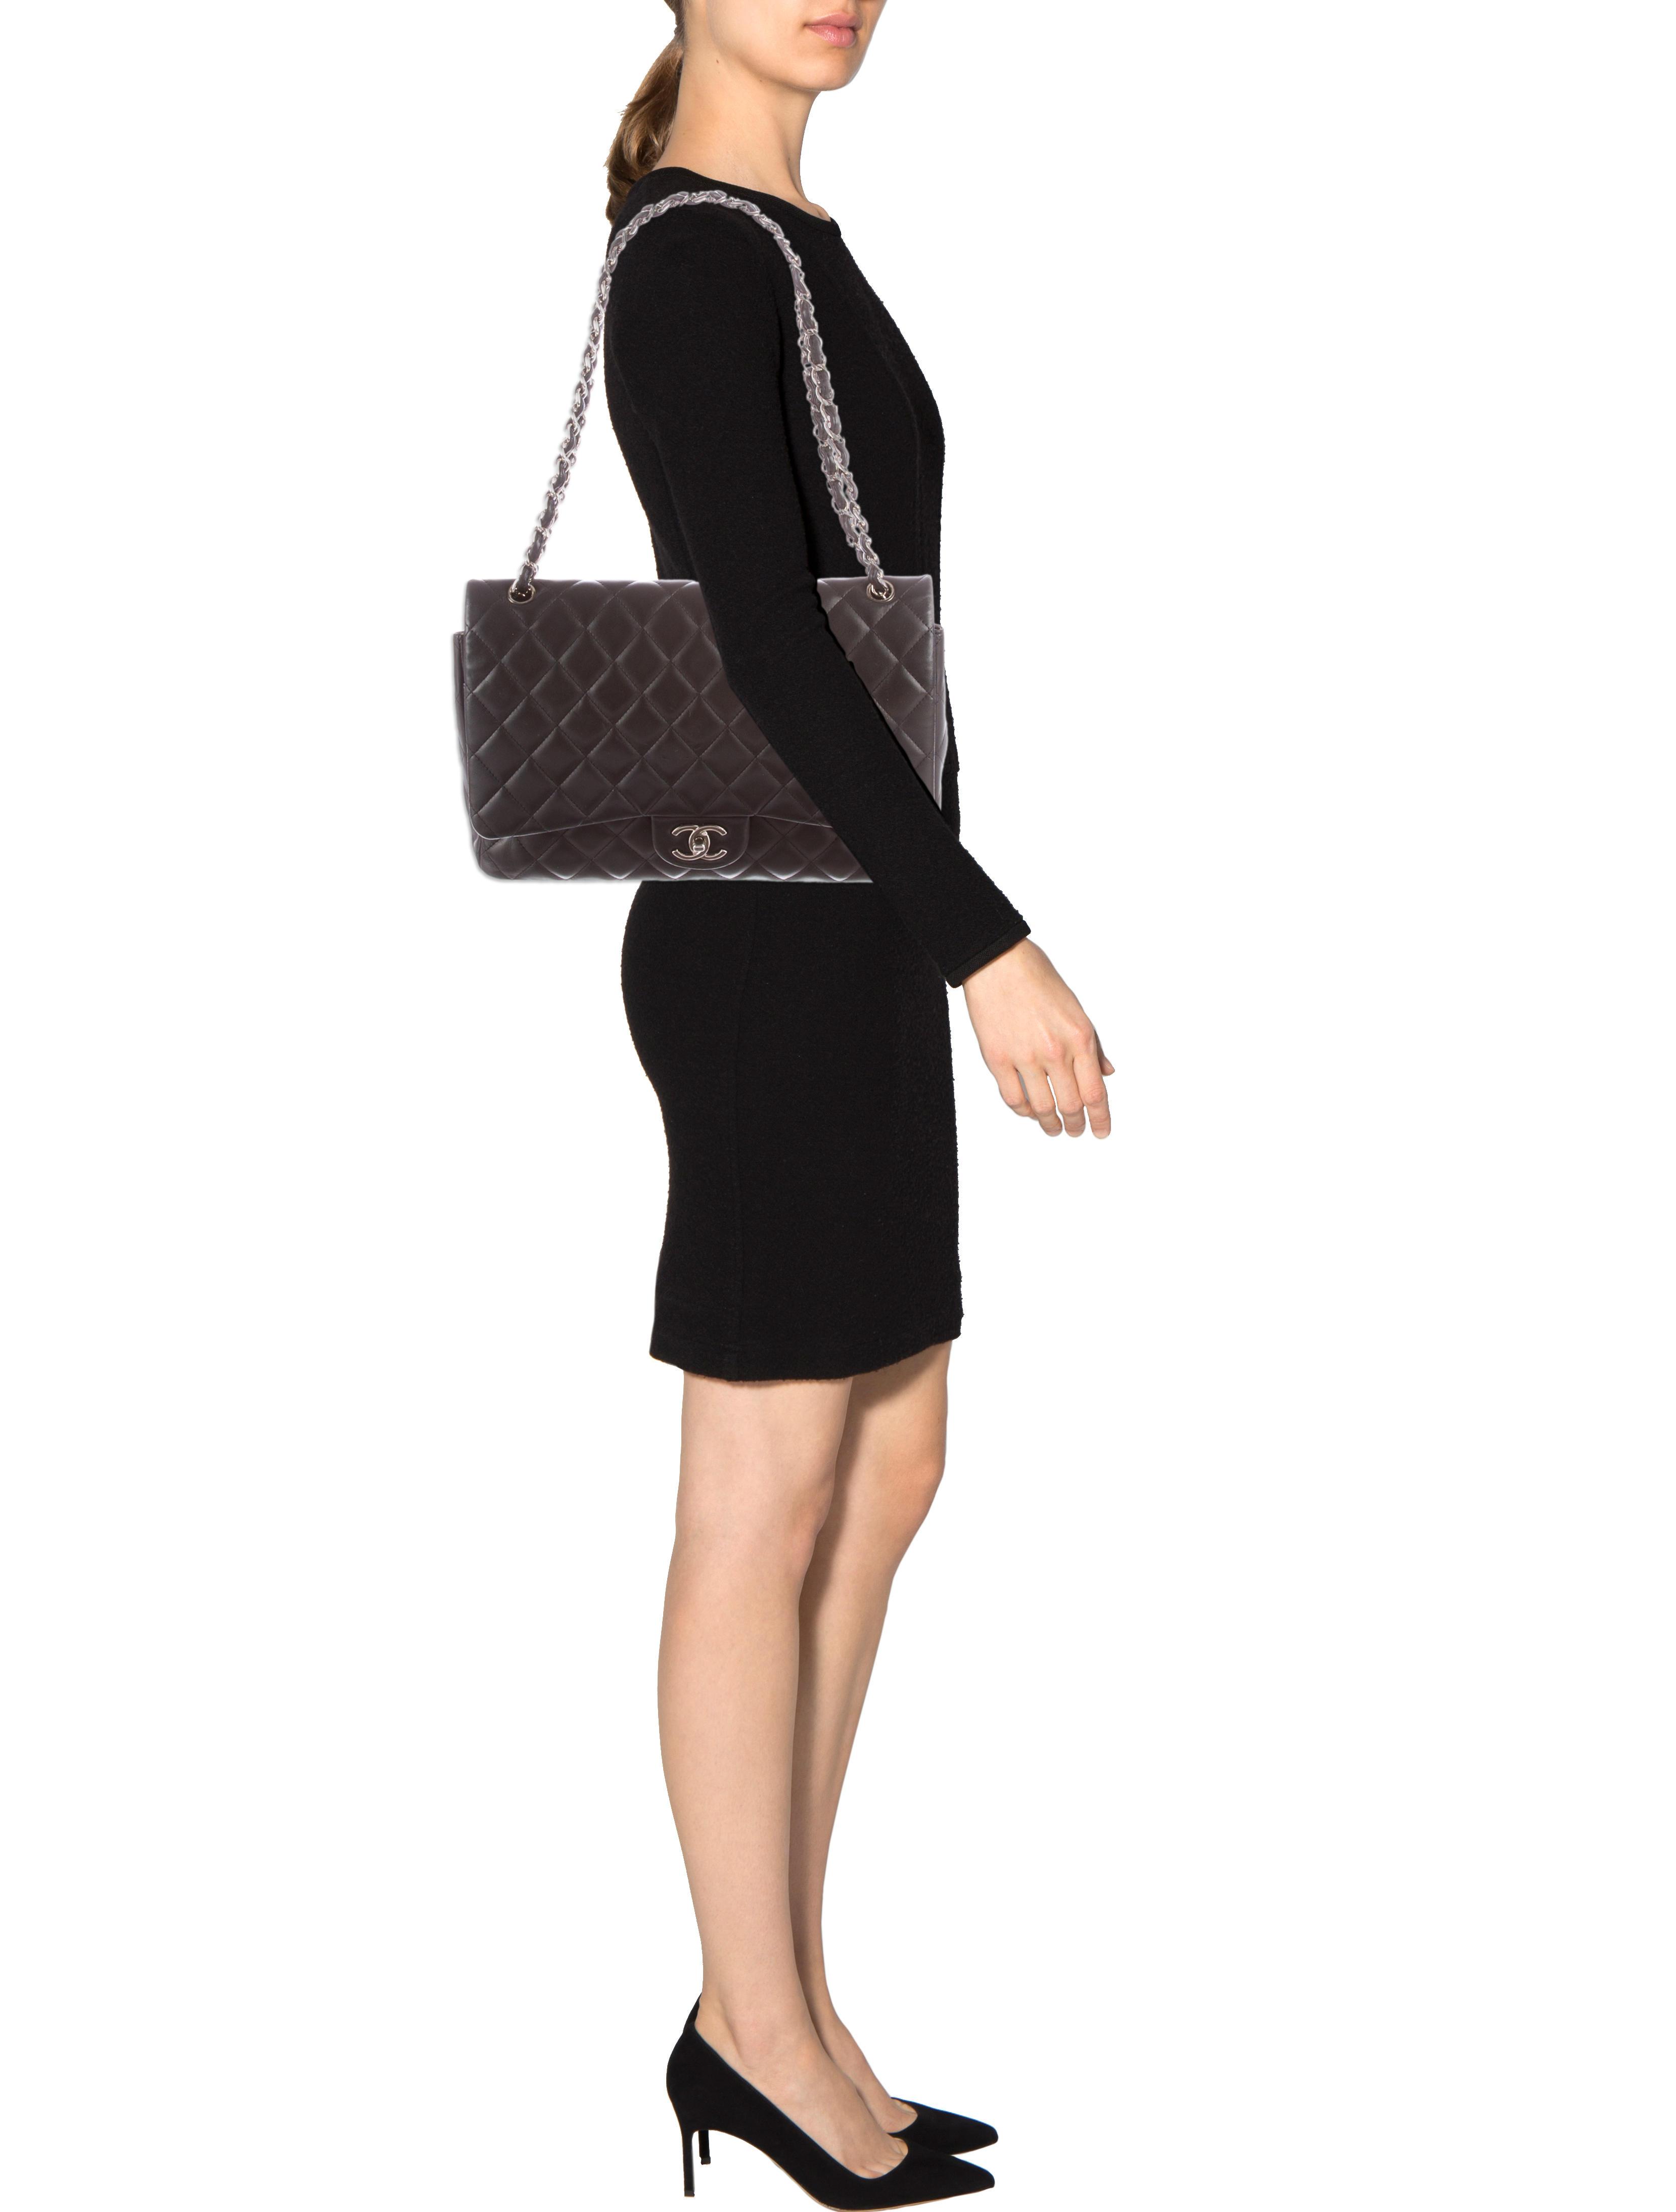 e2b3e3b6d97f2 Chanel Classic Maxi Double Flap Bag